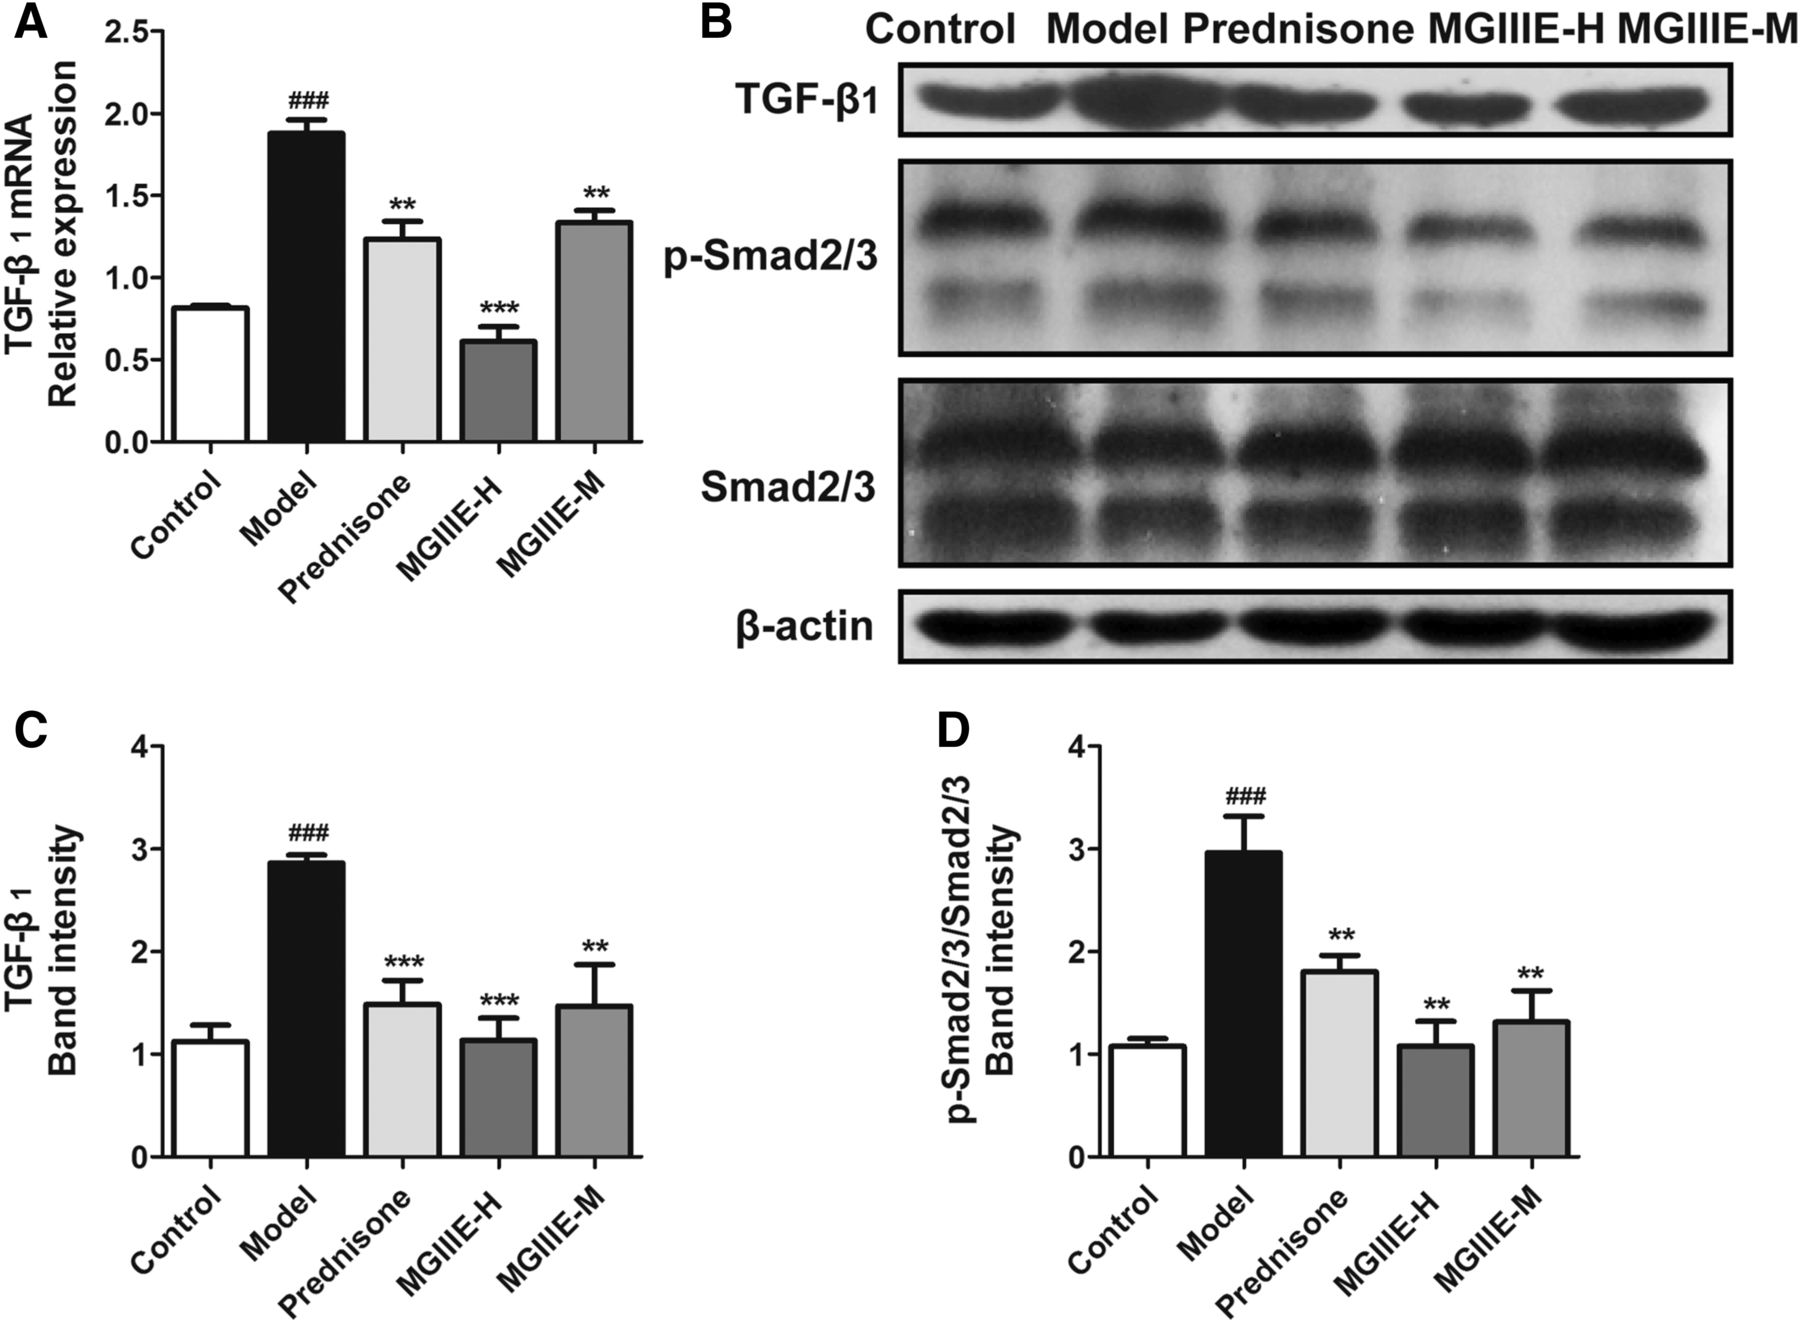 Mogroside IIIE, a Novel Anti-Fibrotic Compound, Reduces Pulmonary